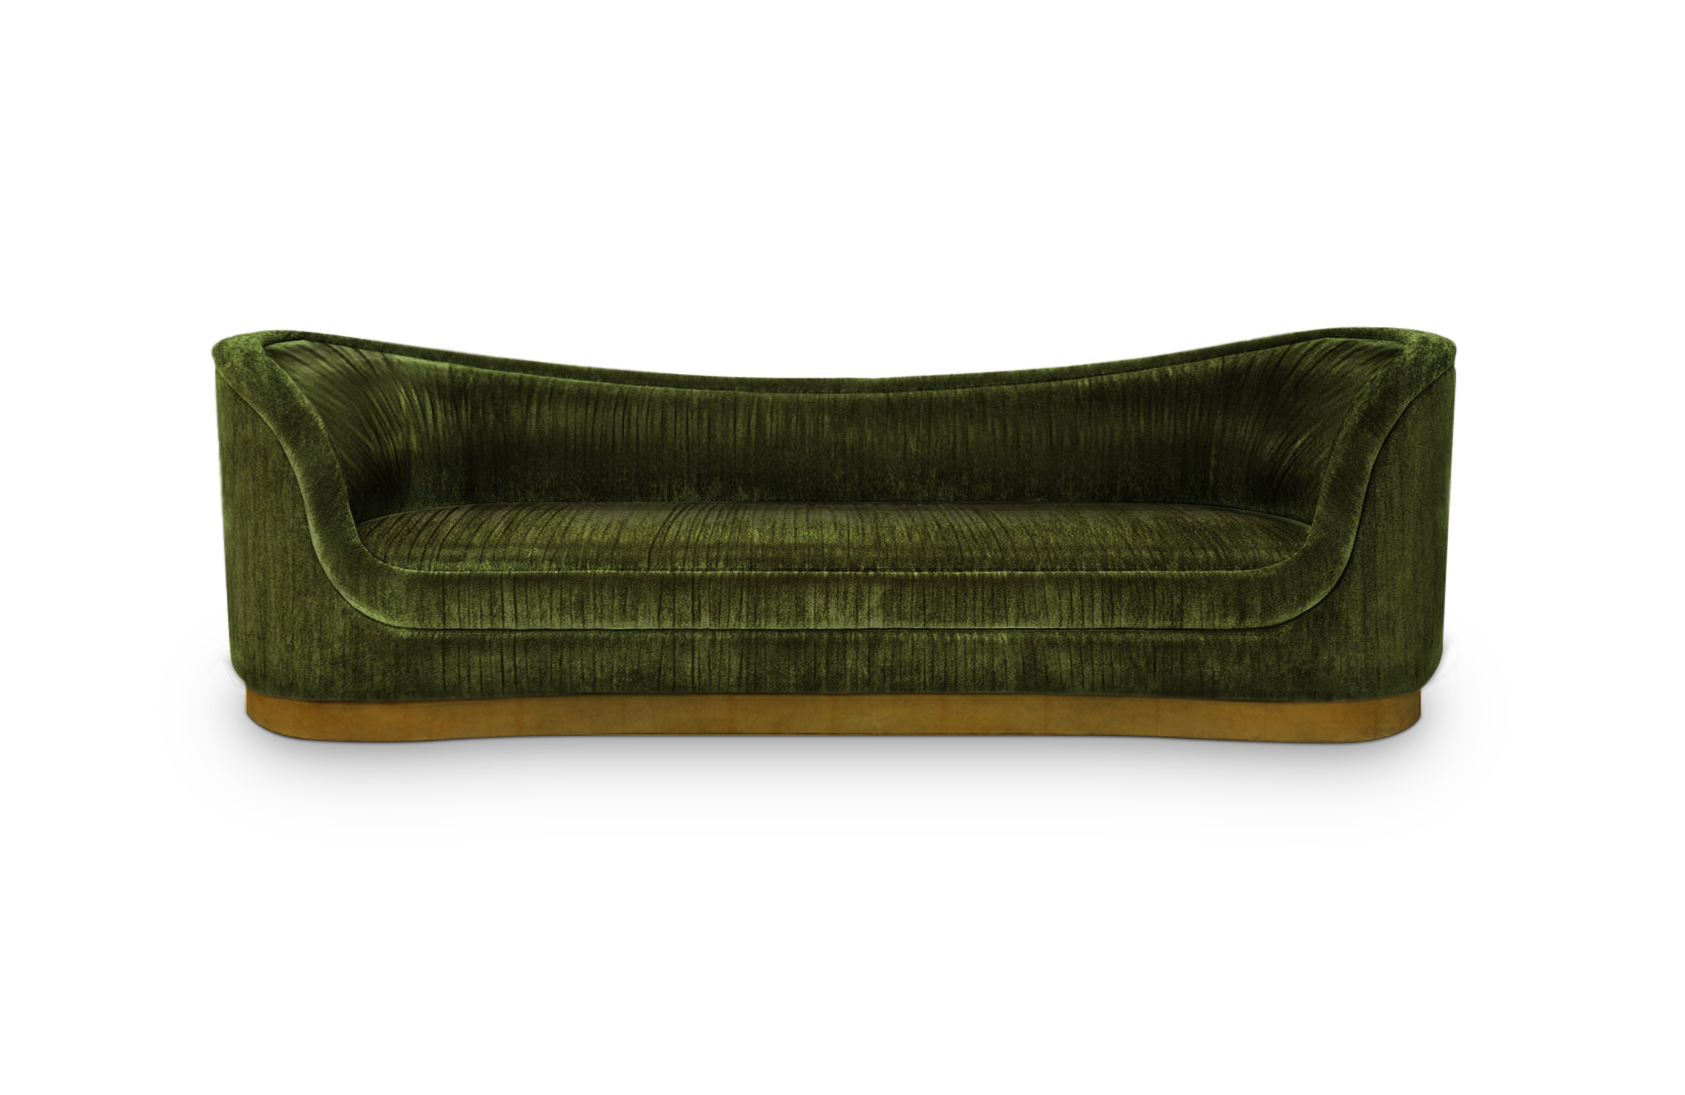 brabbu exklusive designerm bel villatmo de villatmo designer m bel lampen accessoires. Black Bedroom Furniture Sets. Home Design Ideas